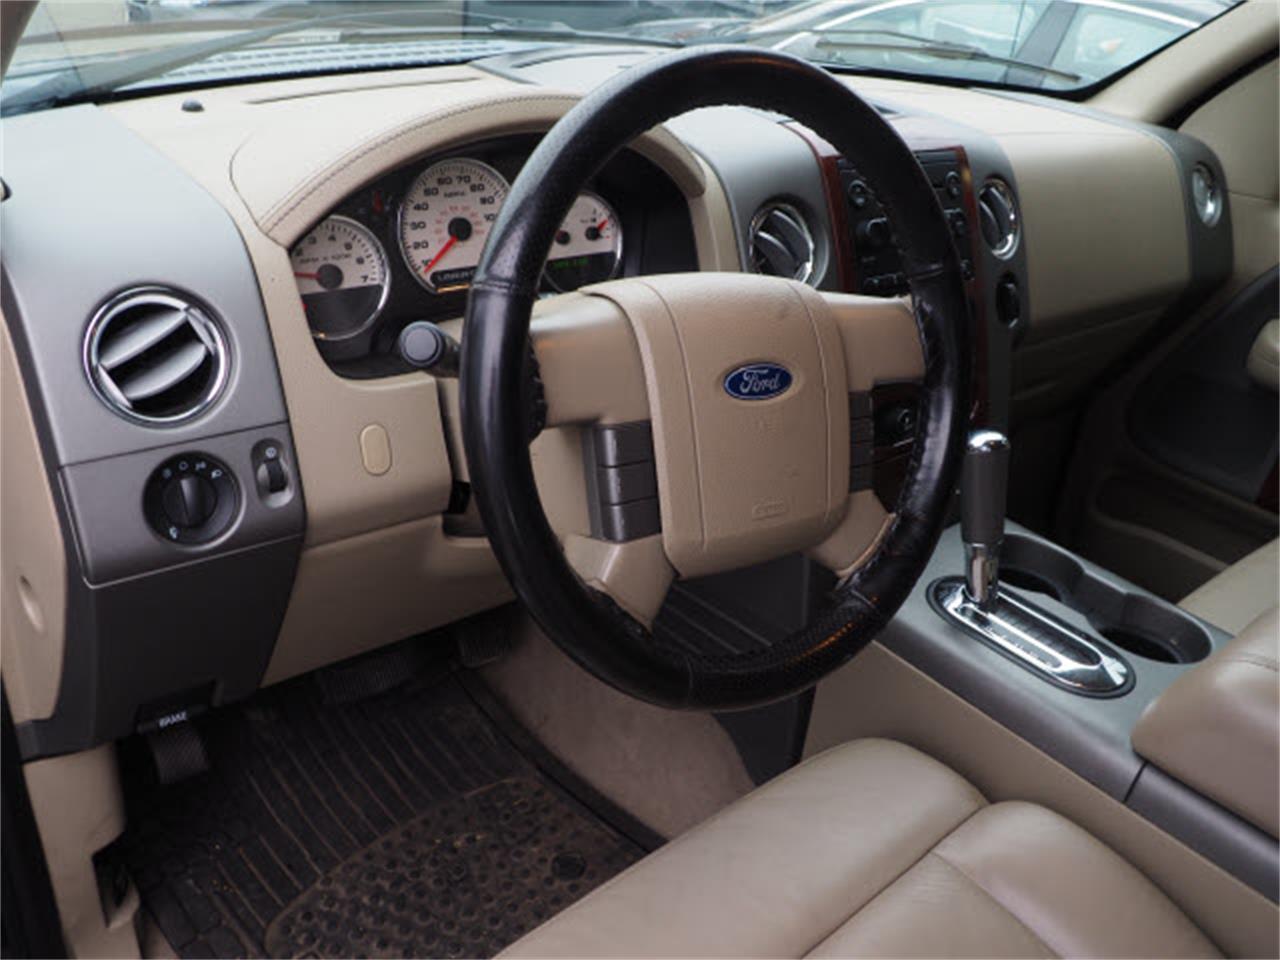 2006 Ford F150 (CC-1417015) for sale in Tacoma, Washington